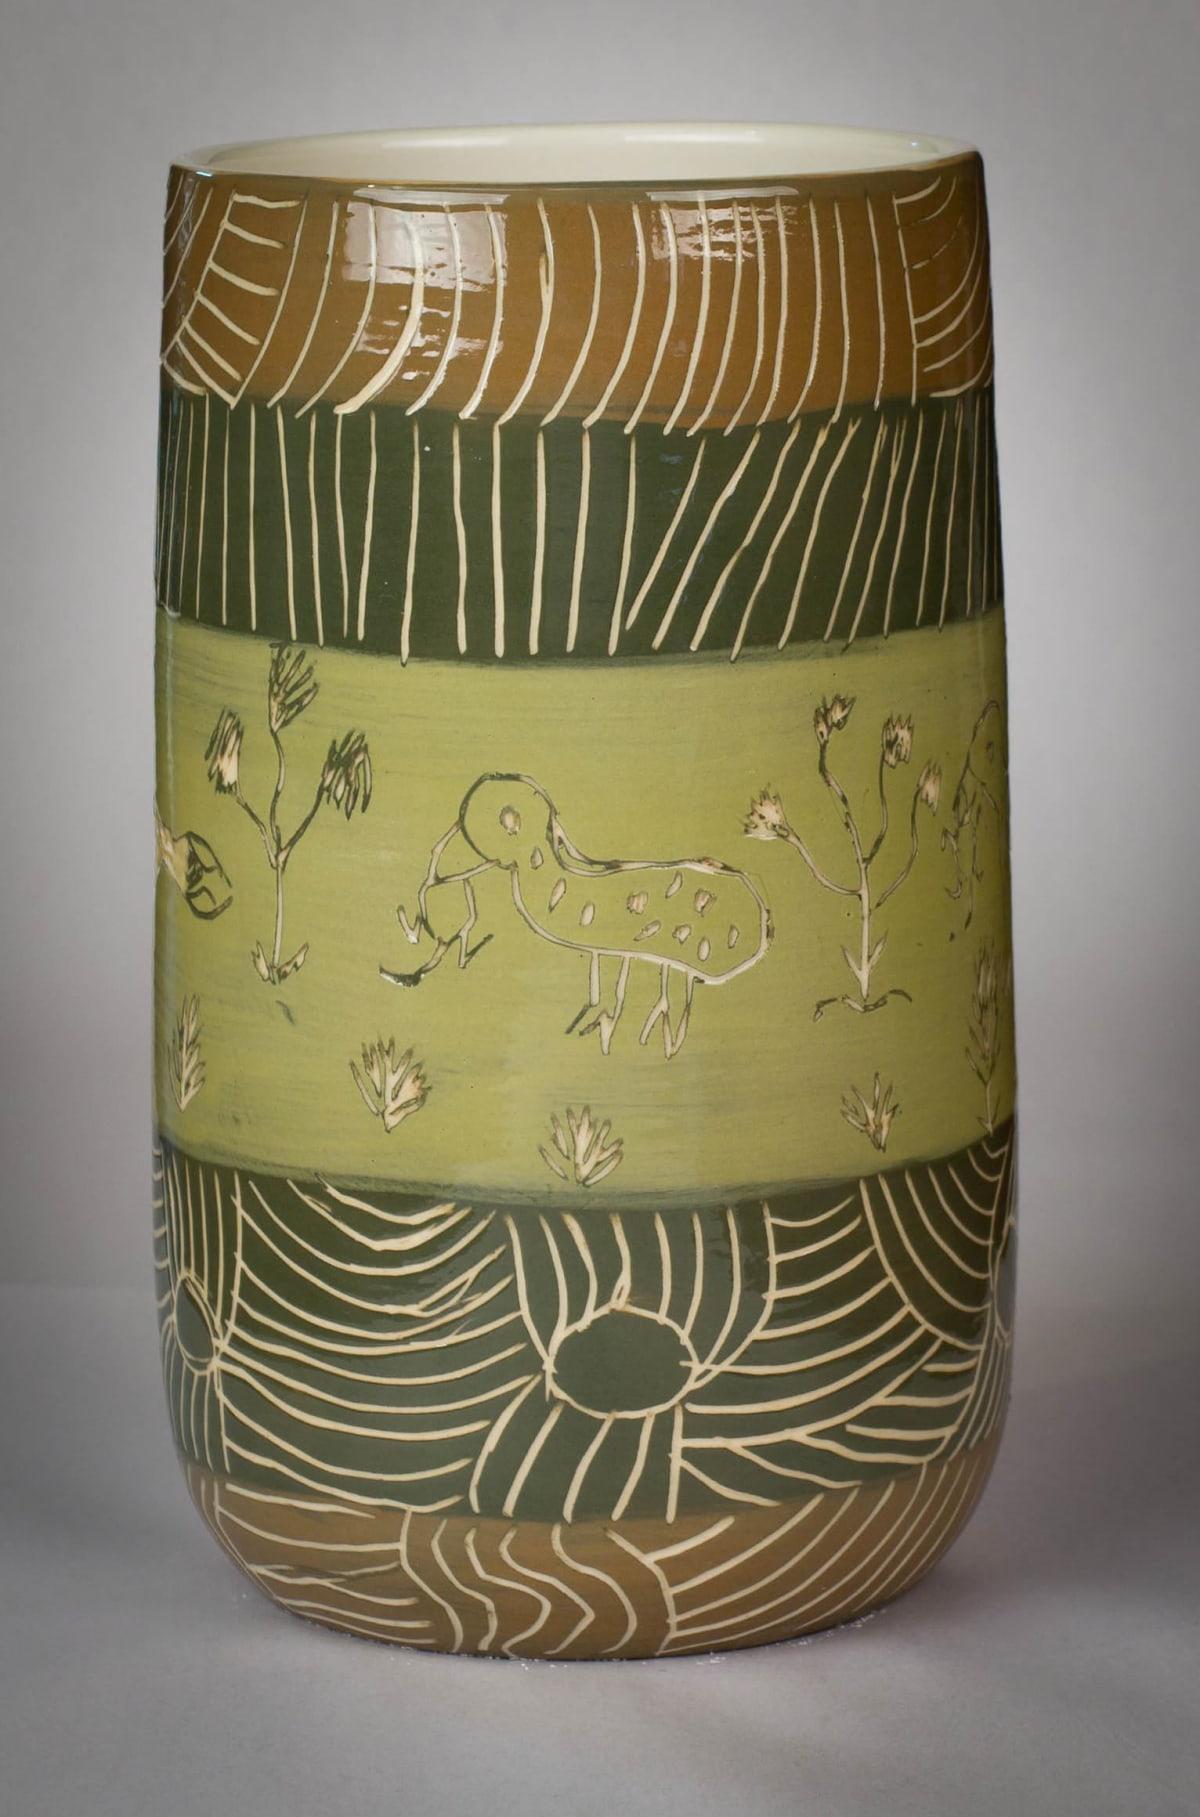 Carlene Thompson Putija 23.5 x 13 cm